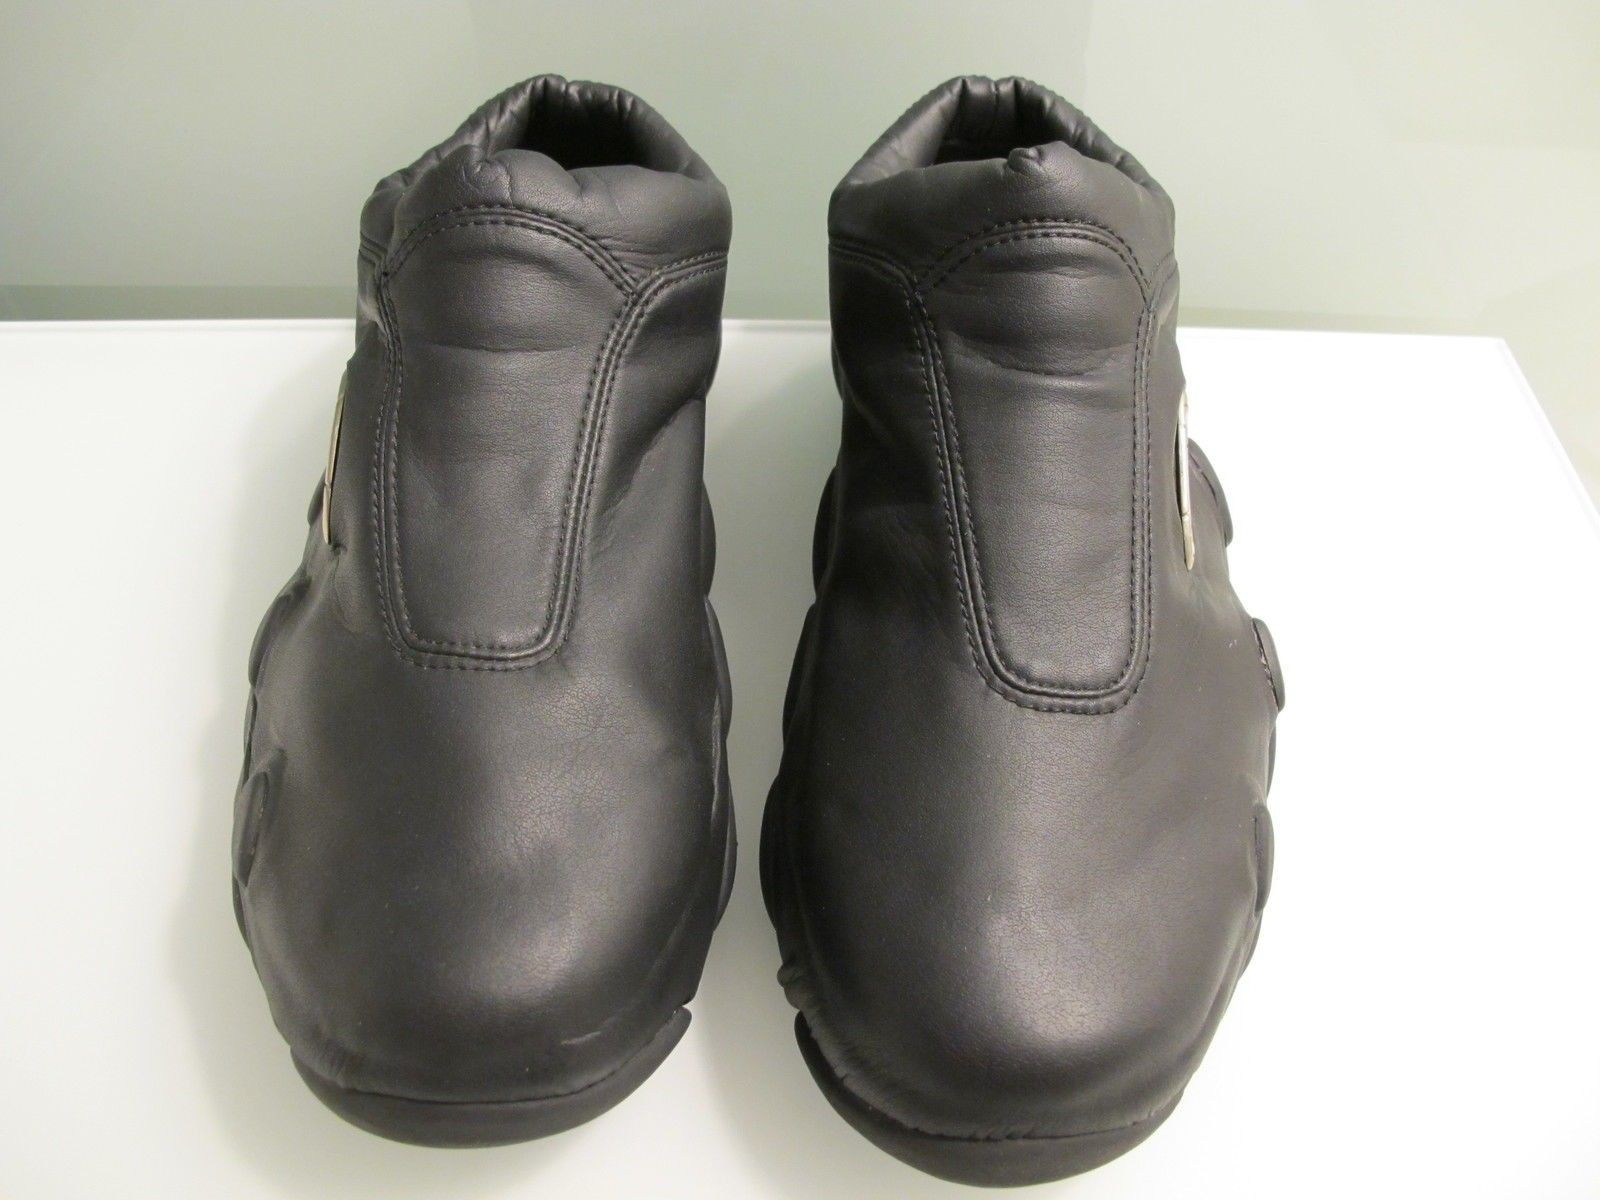 Arrowhead/ Flesh Prototype Shoes...anyone has any info on this? - $_57 (1).jpg